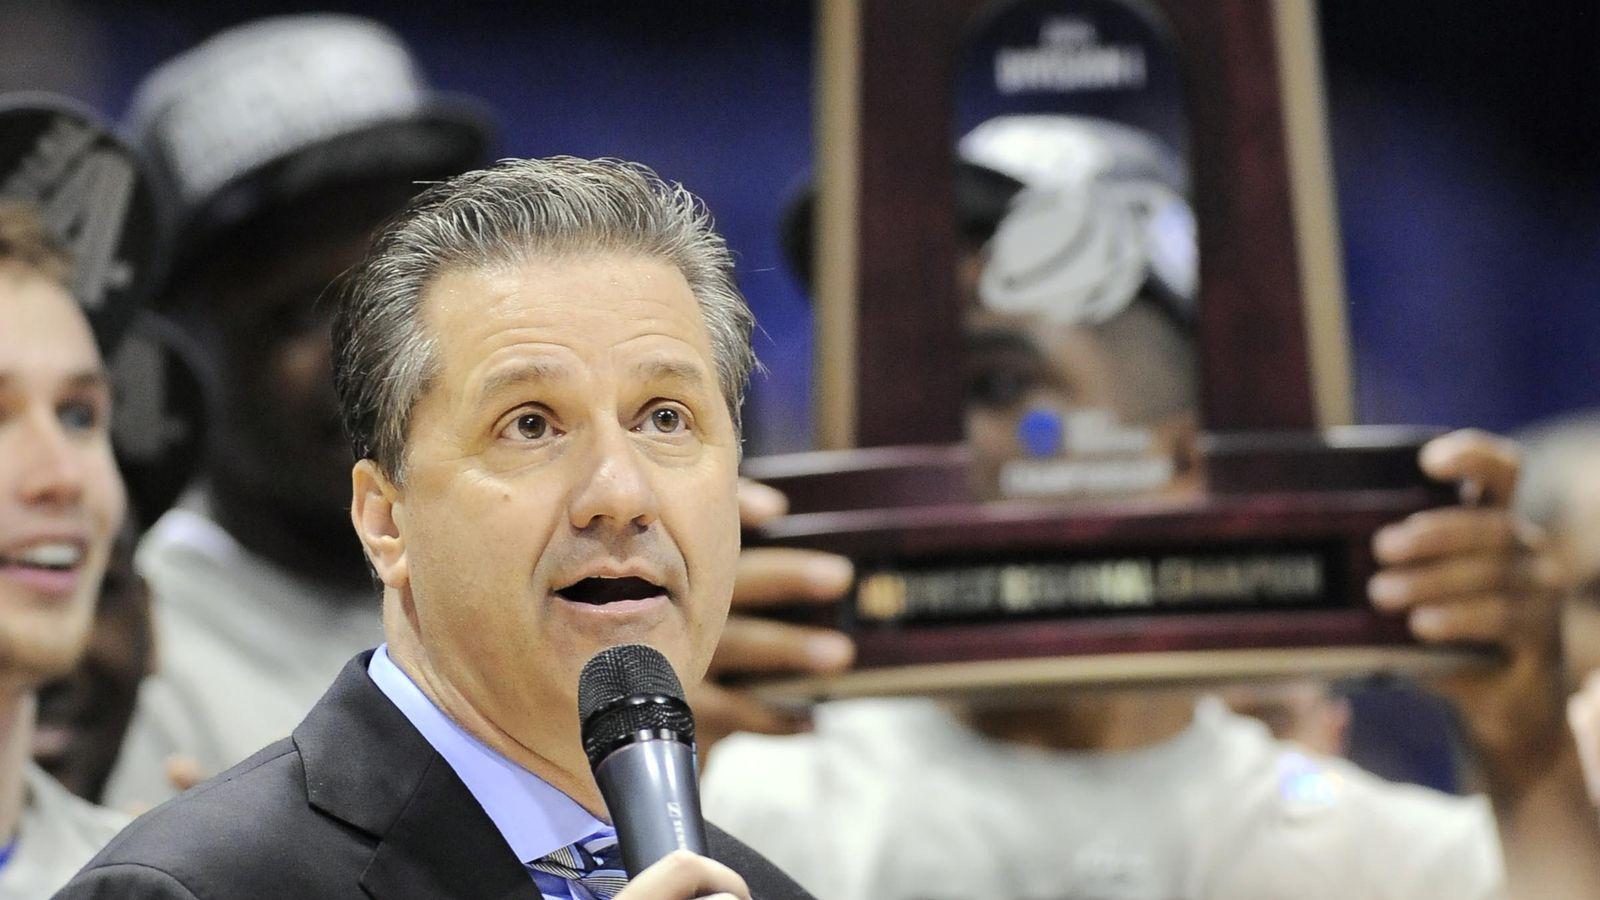 Does Calipari Regret Staying At Kentucky?